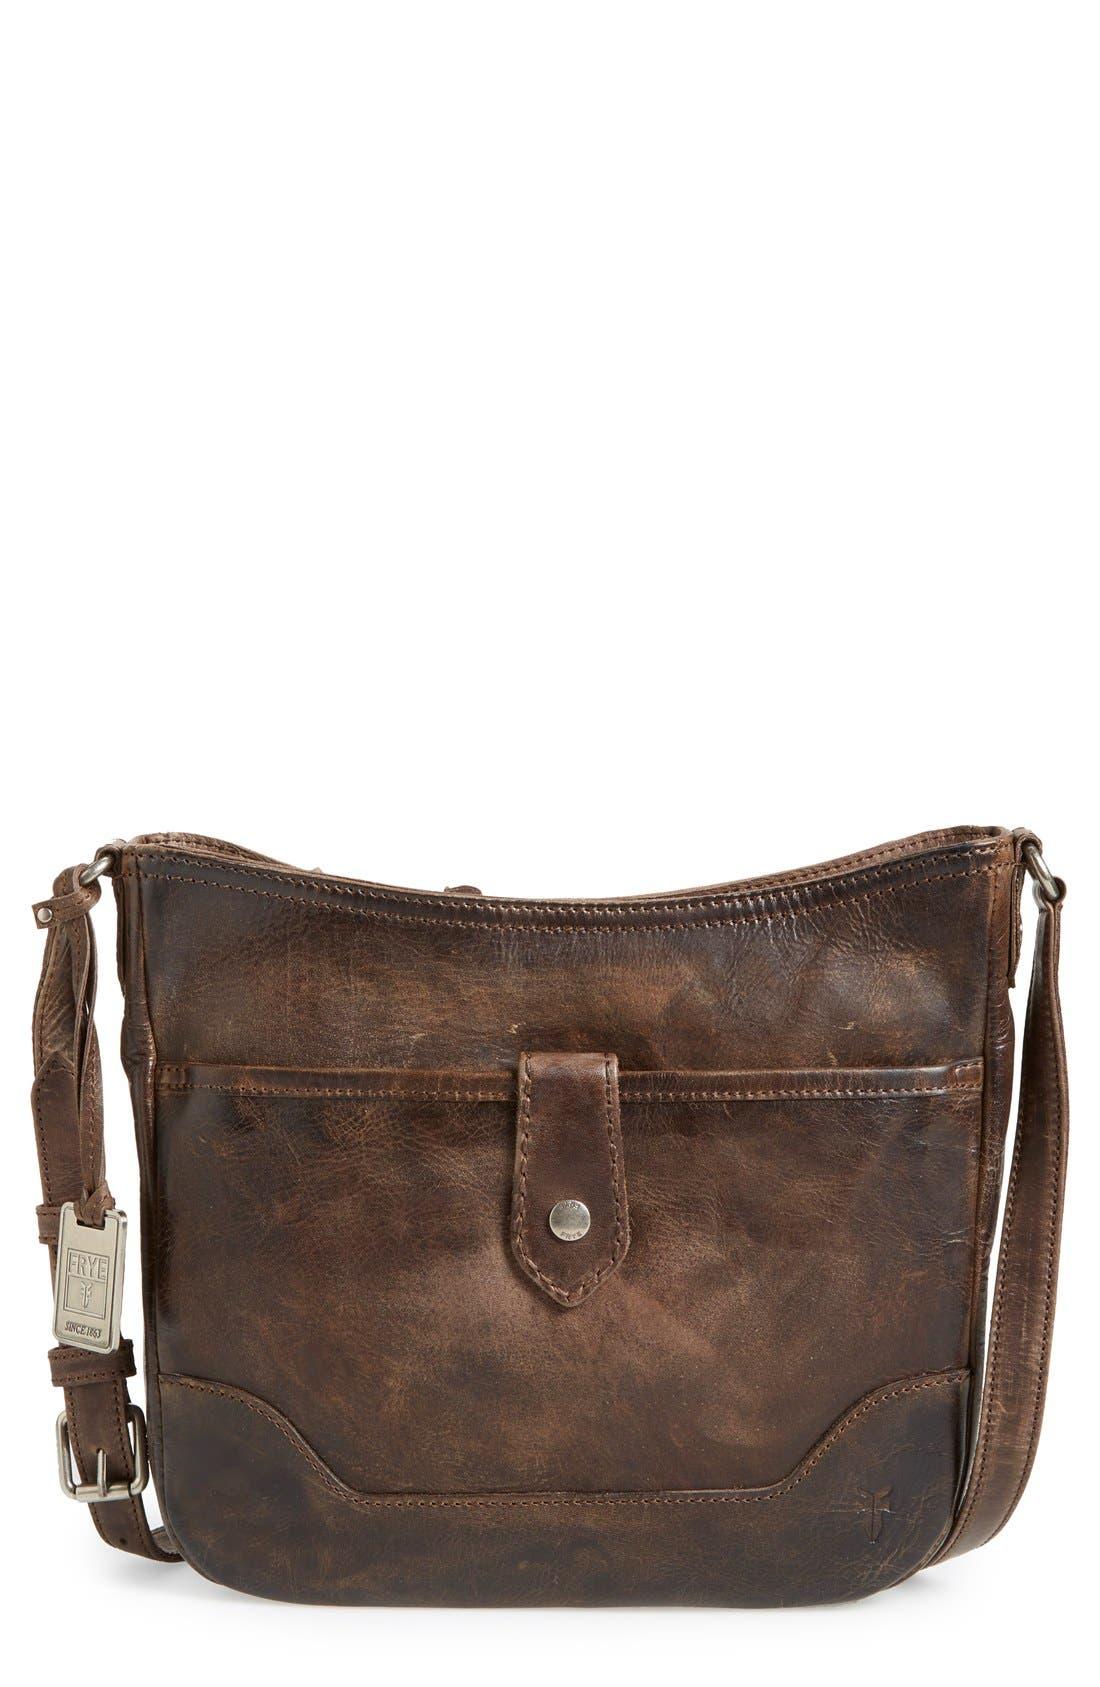 Frye Melissa Button Crossbody Bag